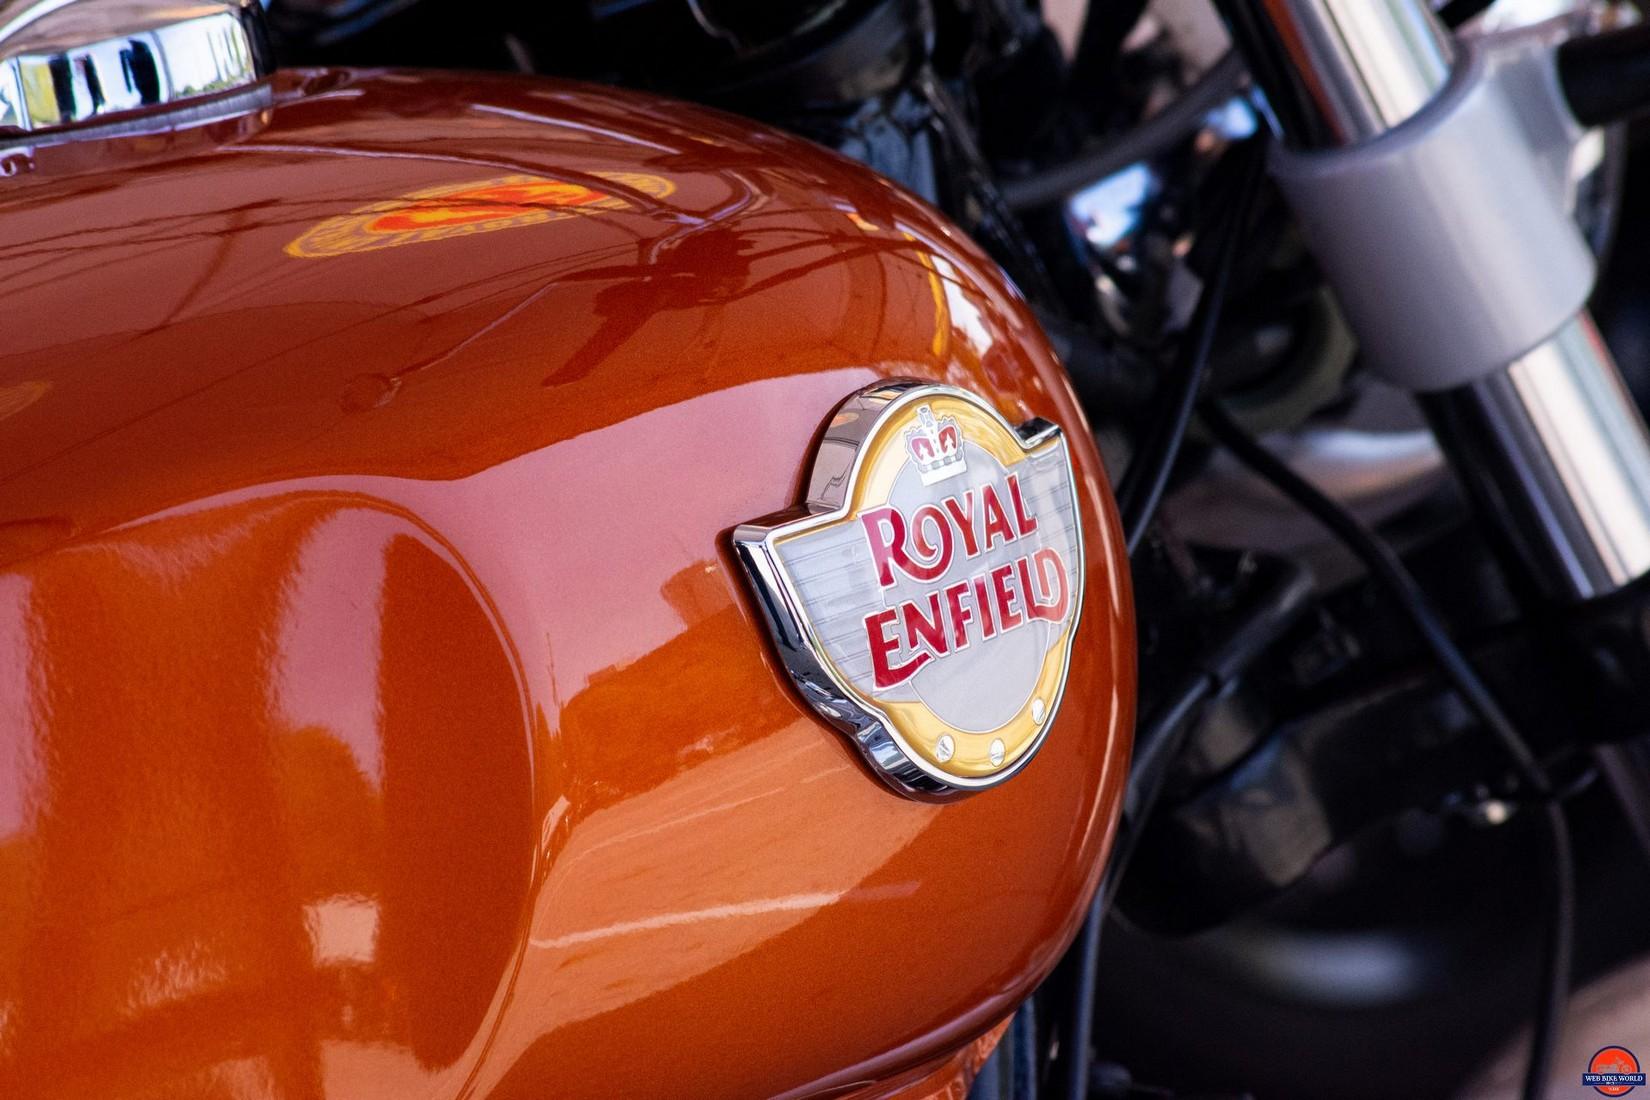 2019 Royal Enfield INT650 gas tank badging.